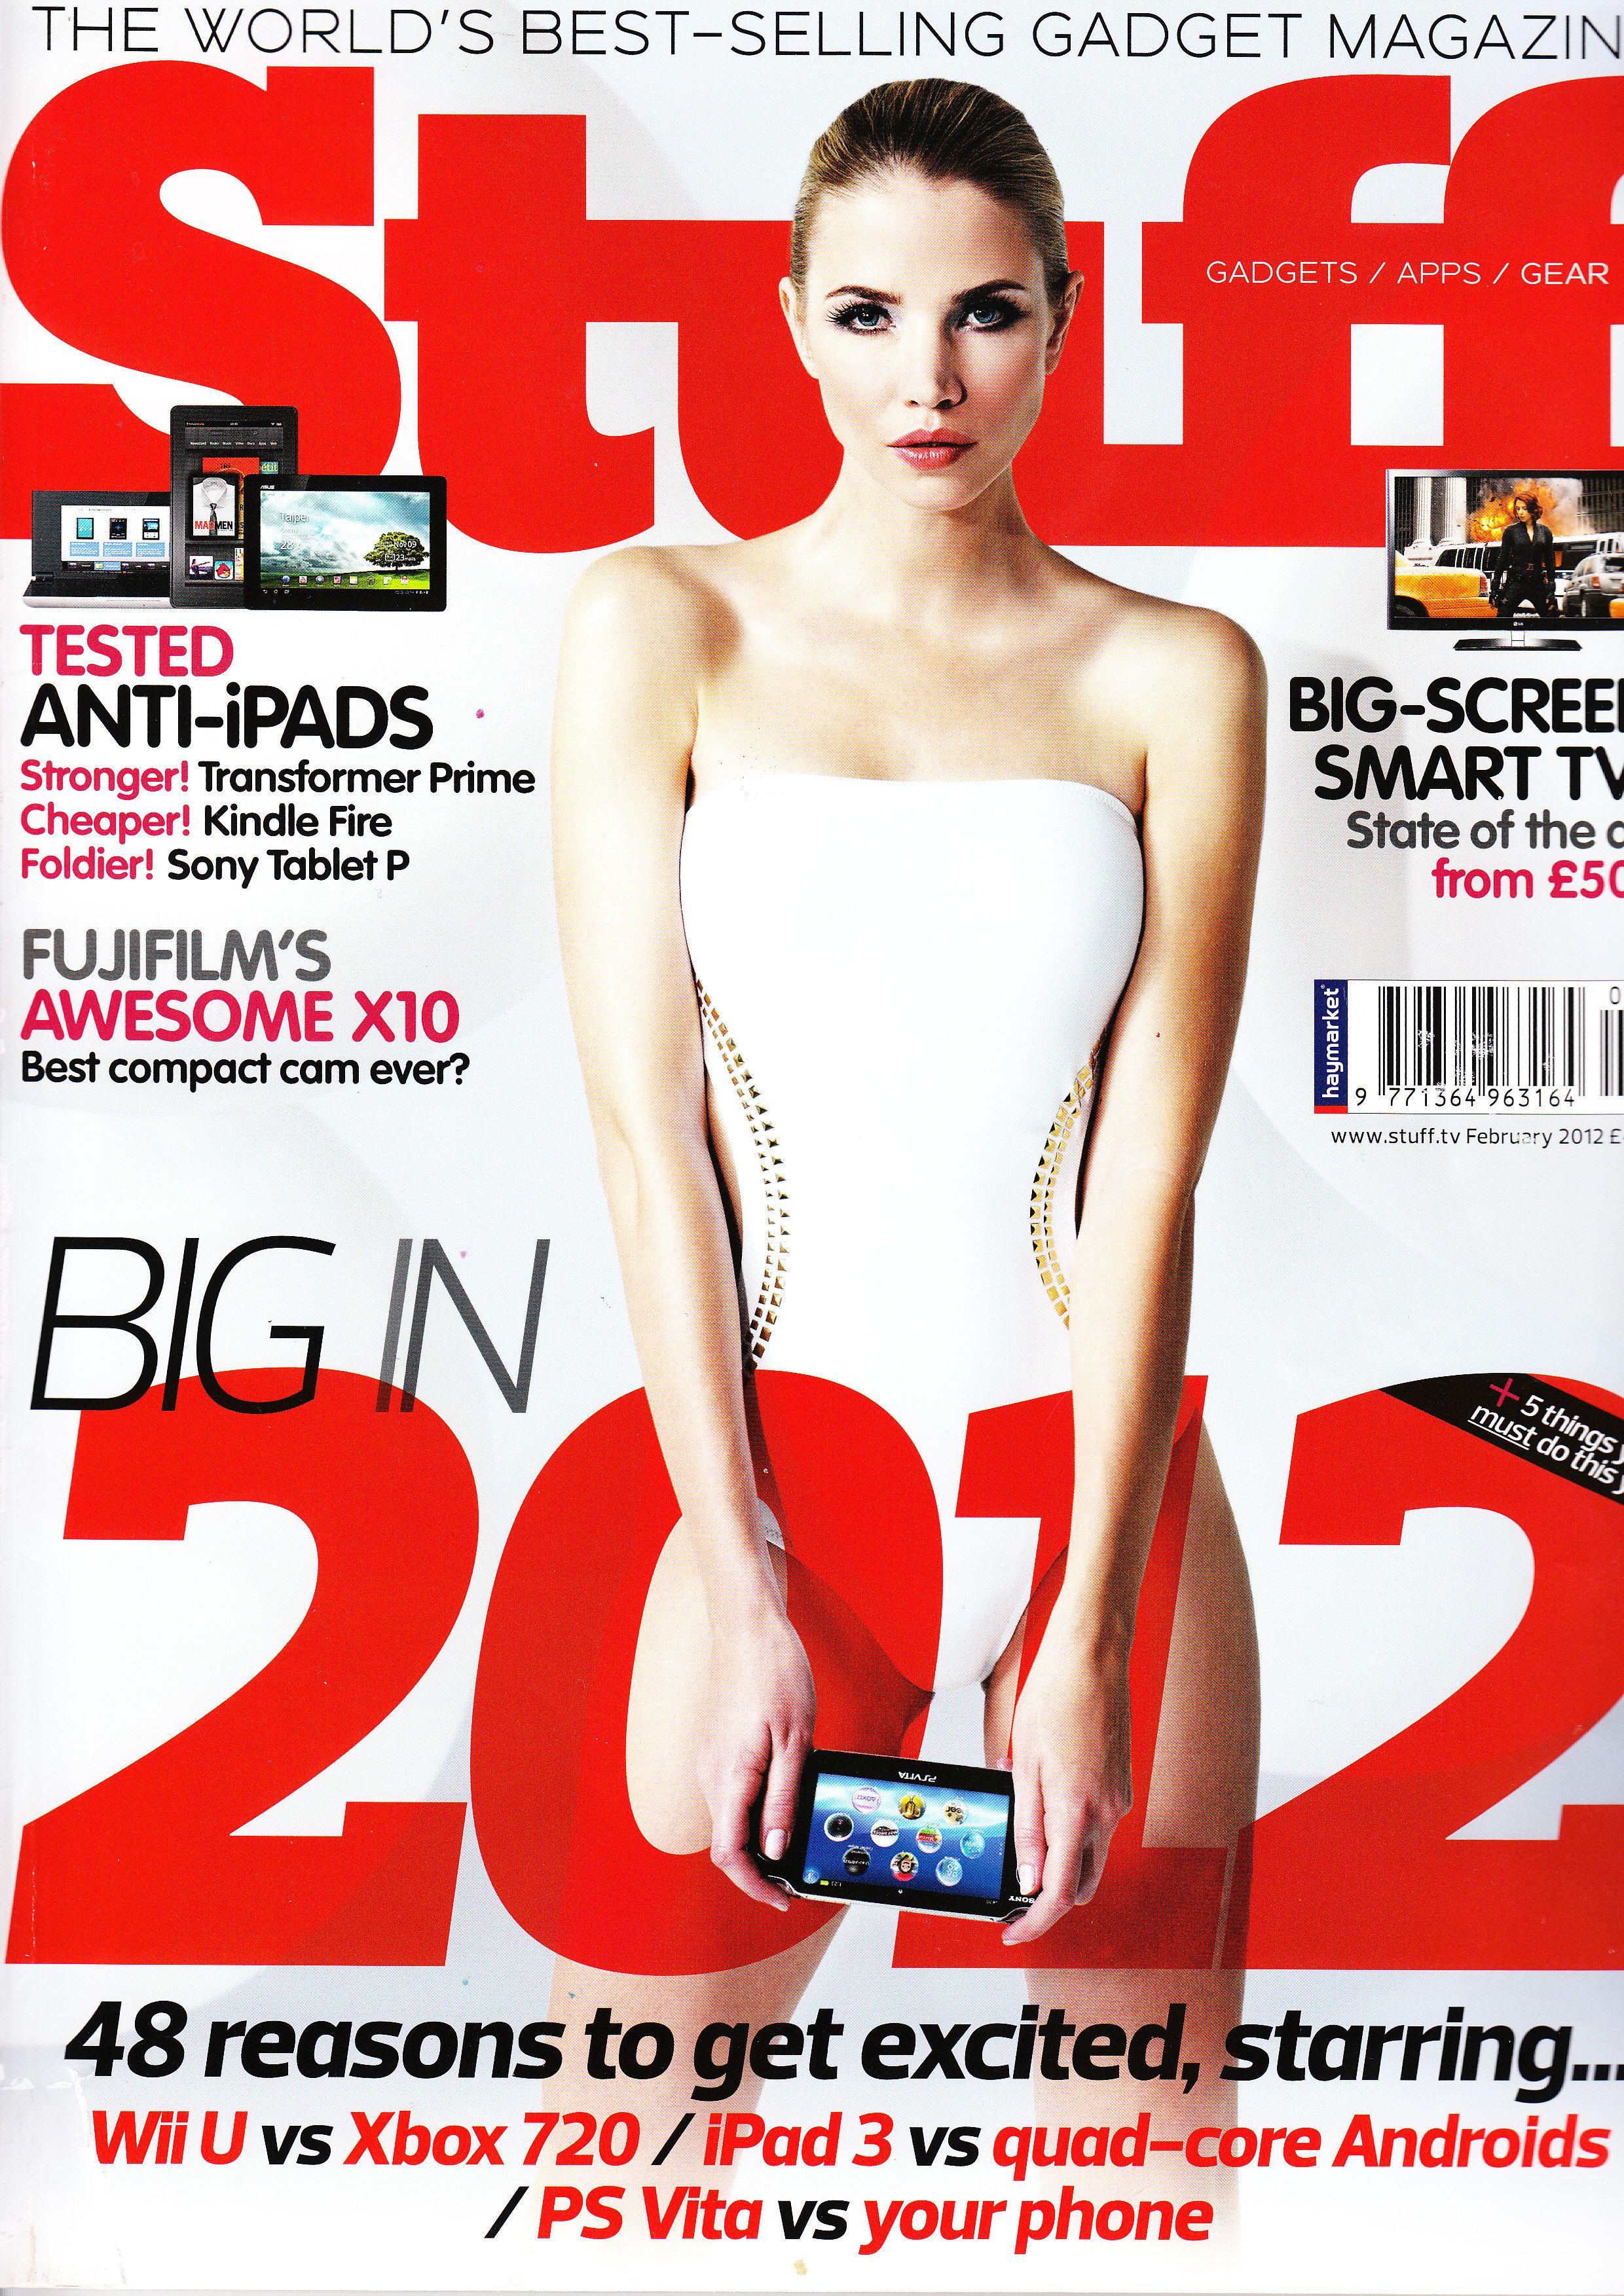 Stuff The Worlds BestSelling Gadget Magazine Gadget